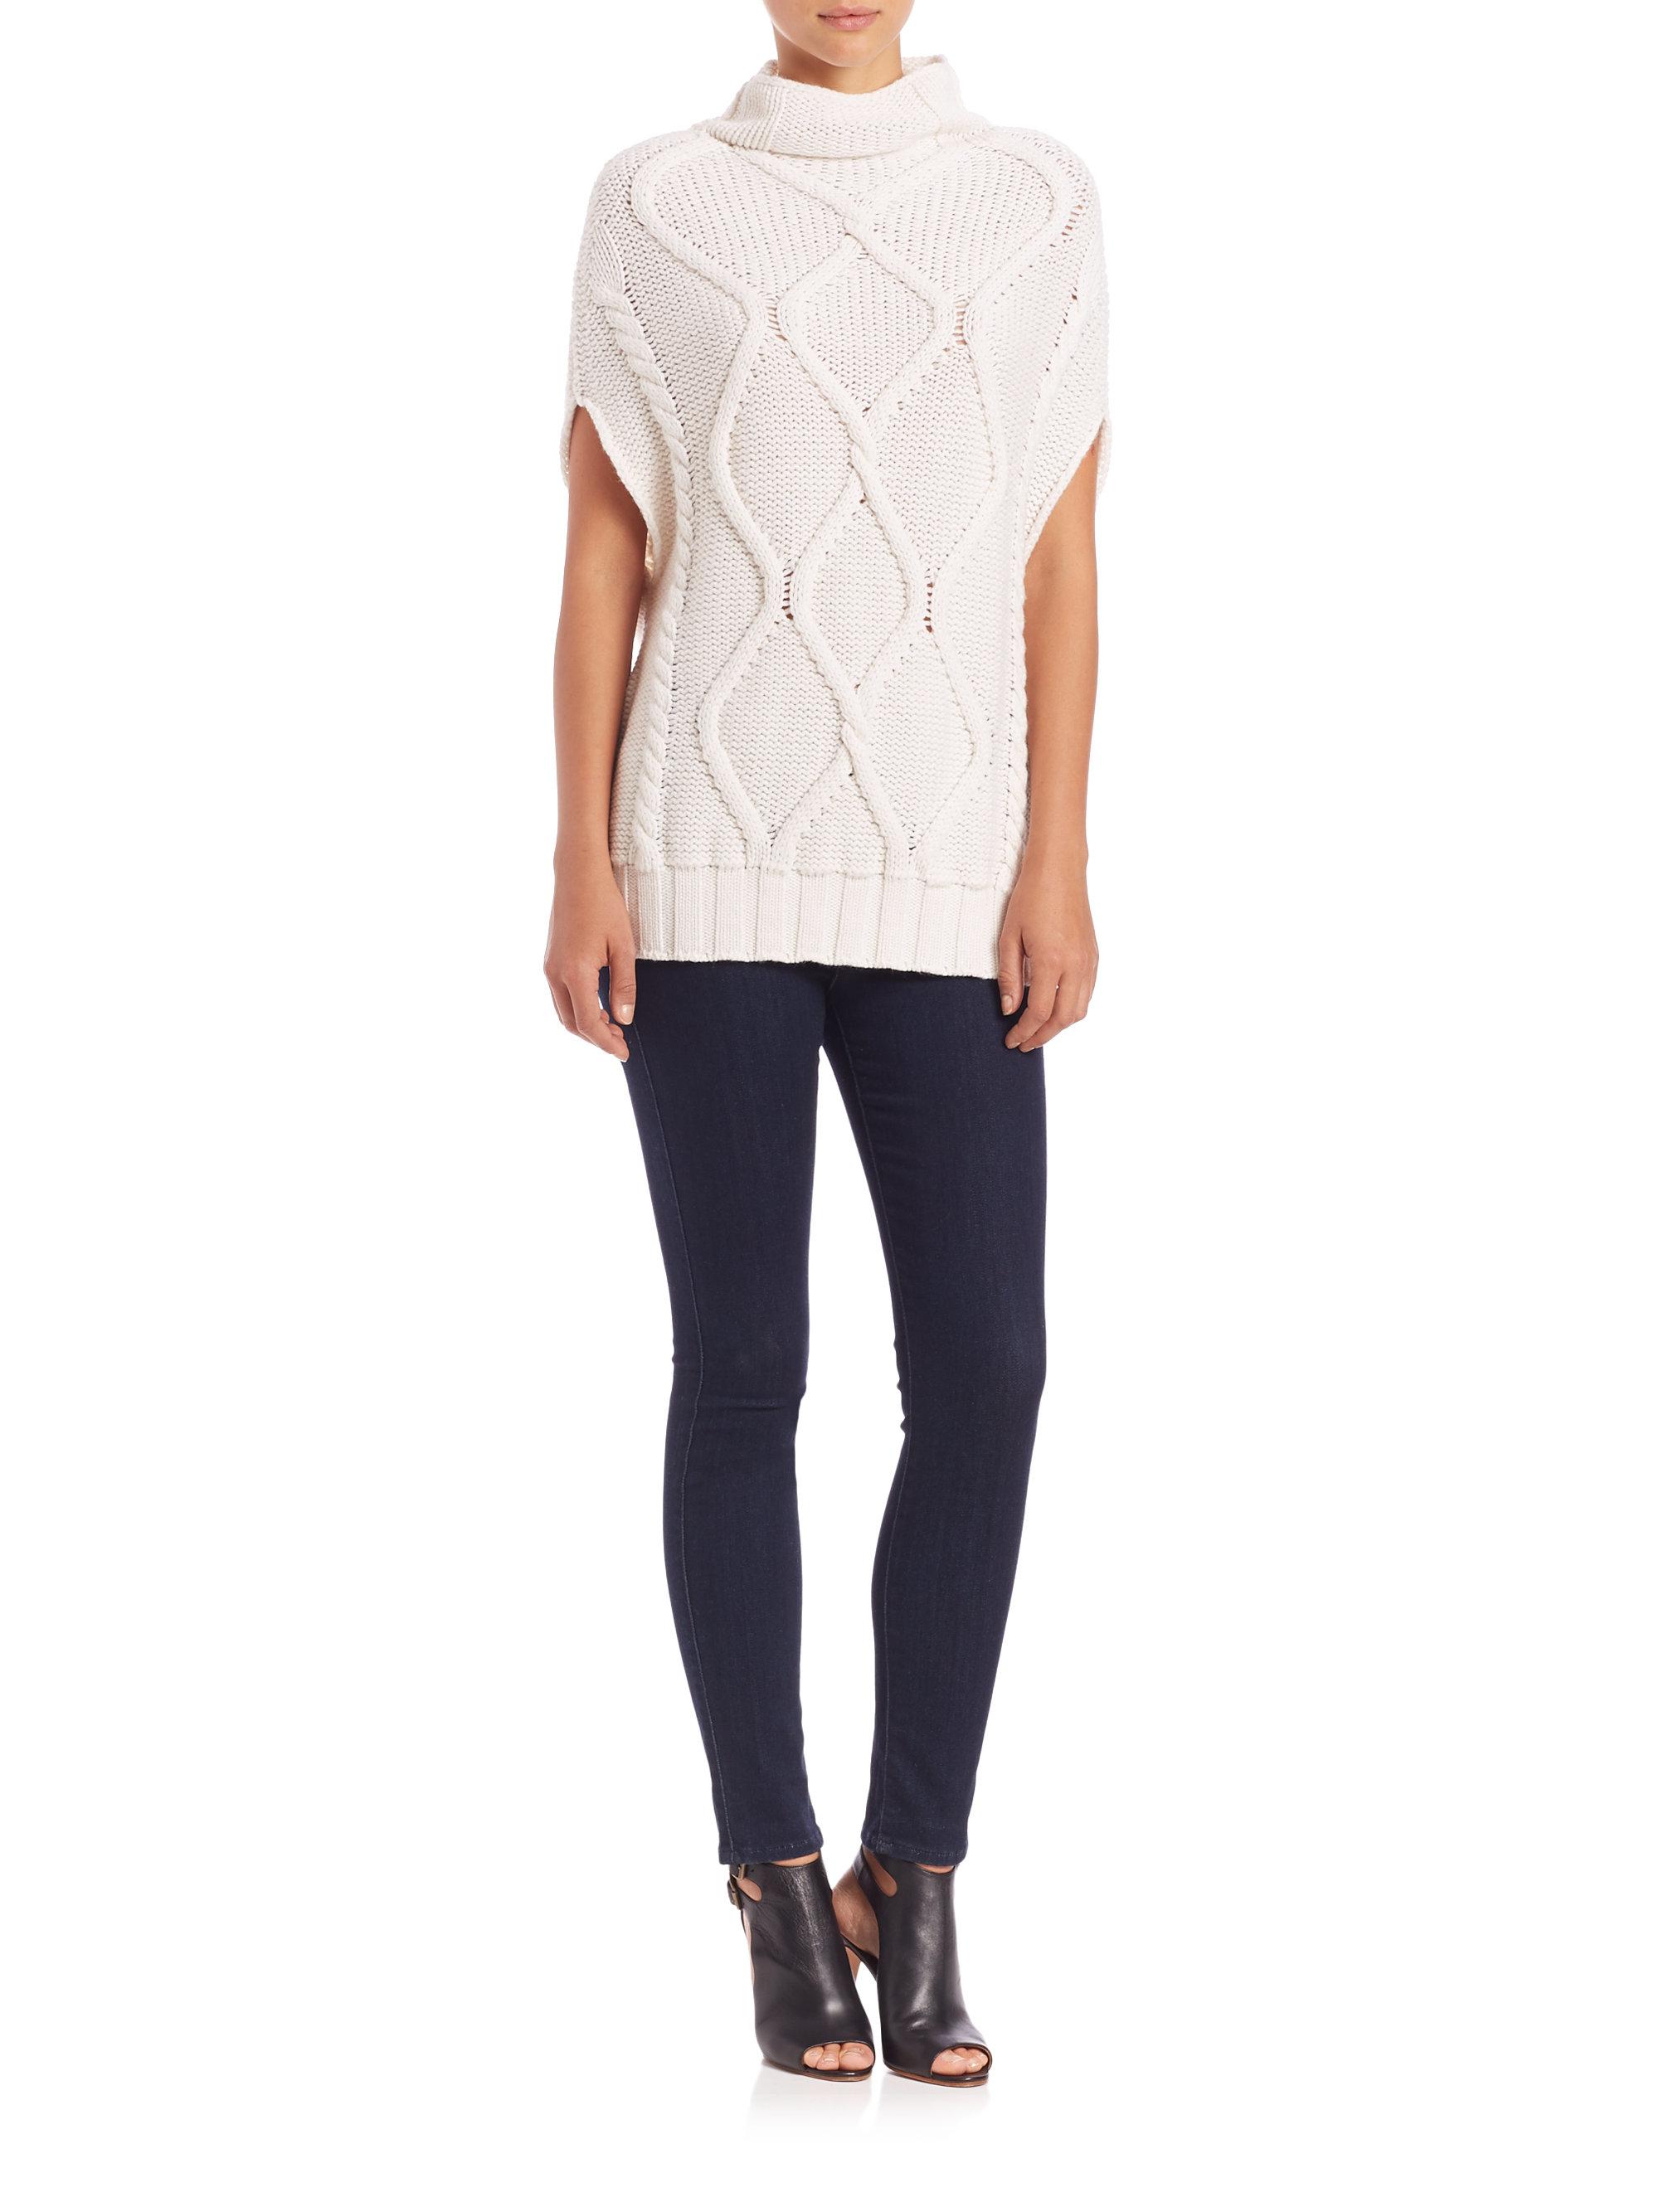 White Turtleneck Knit Sweater 13